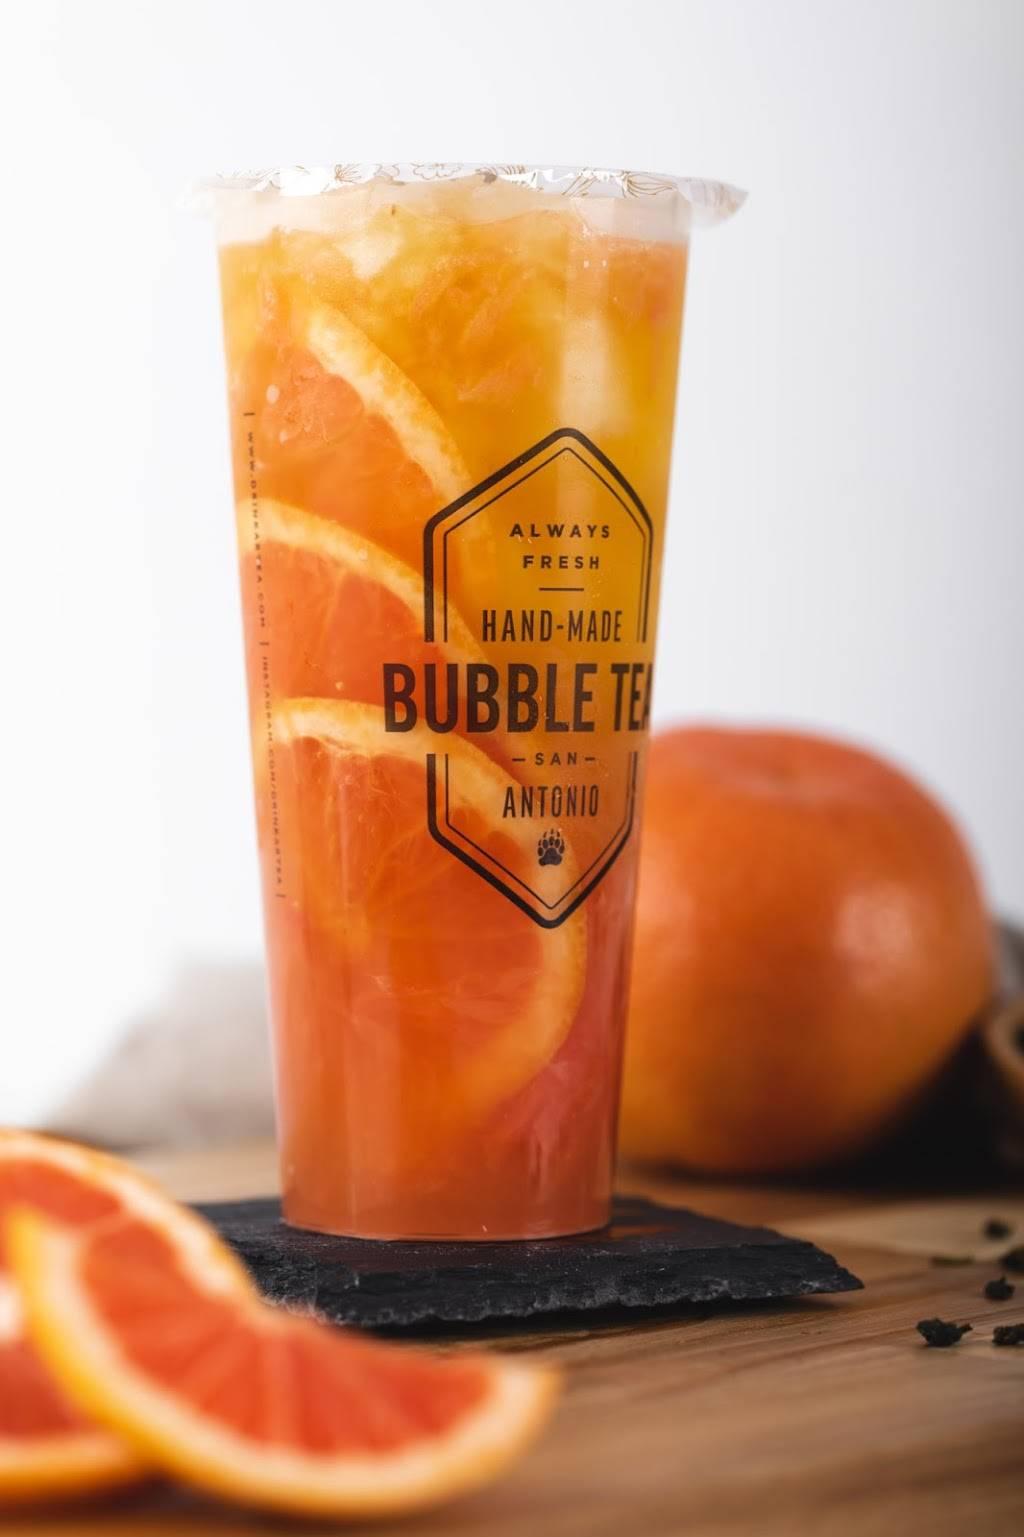 Artea Bubble Tea + Eats - cafe  | Photo 5 of 10 | Address: 6362 De Zavala Rd #108, San Antonio, TX 78249, USA | Phone: (210) 462-1388